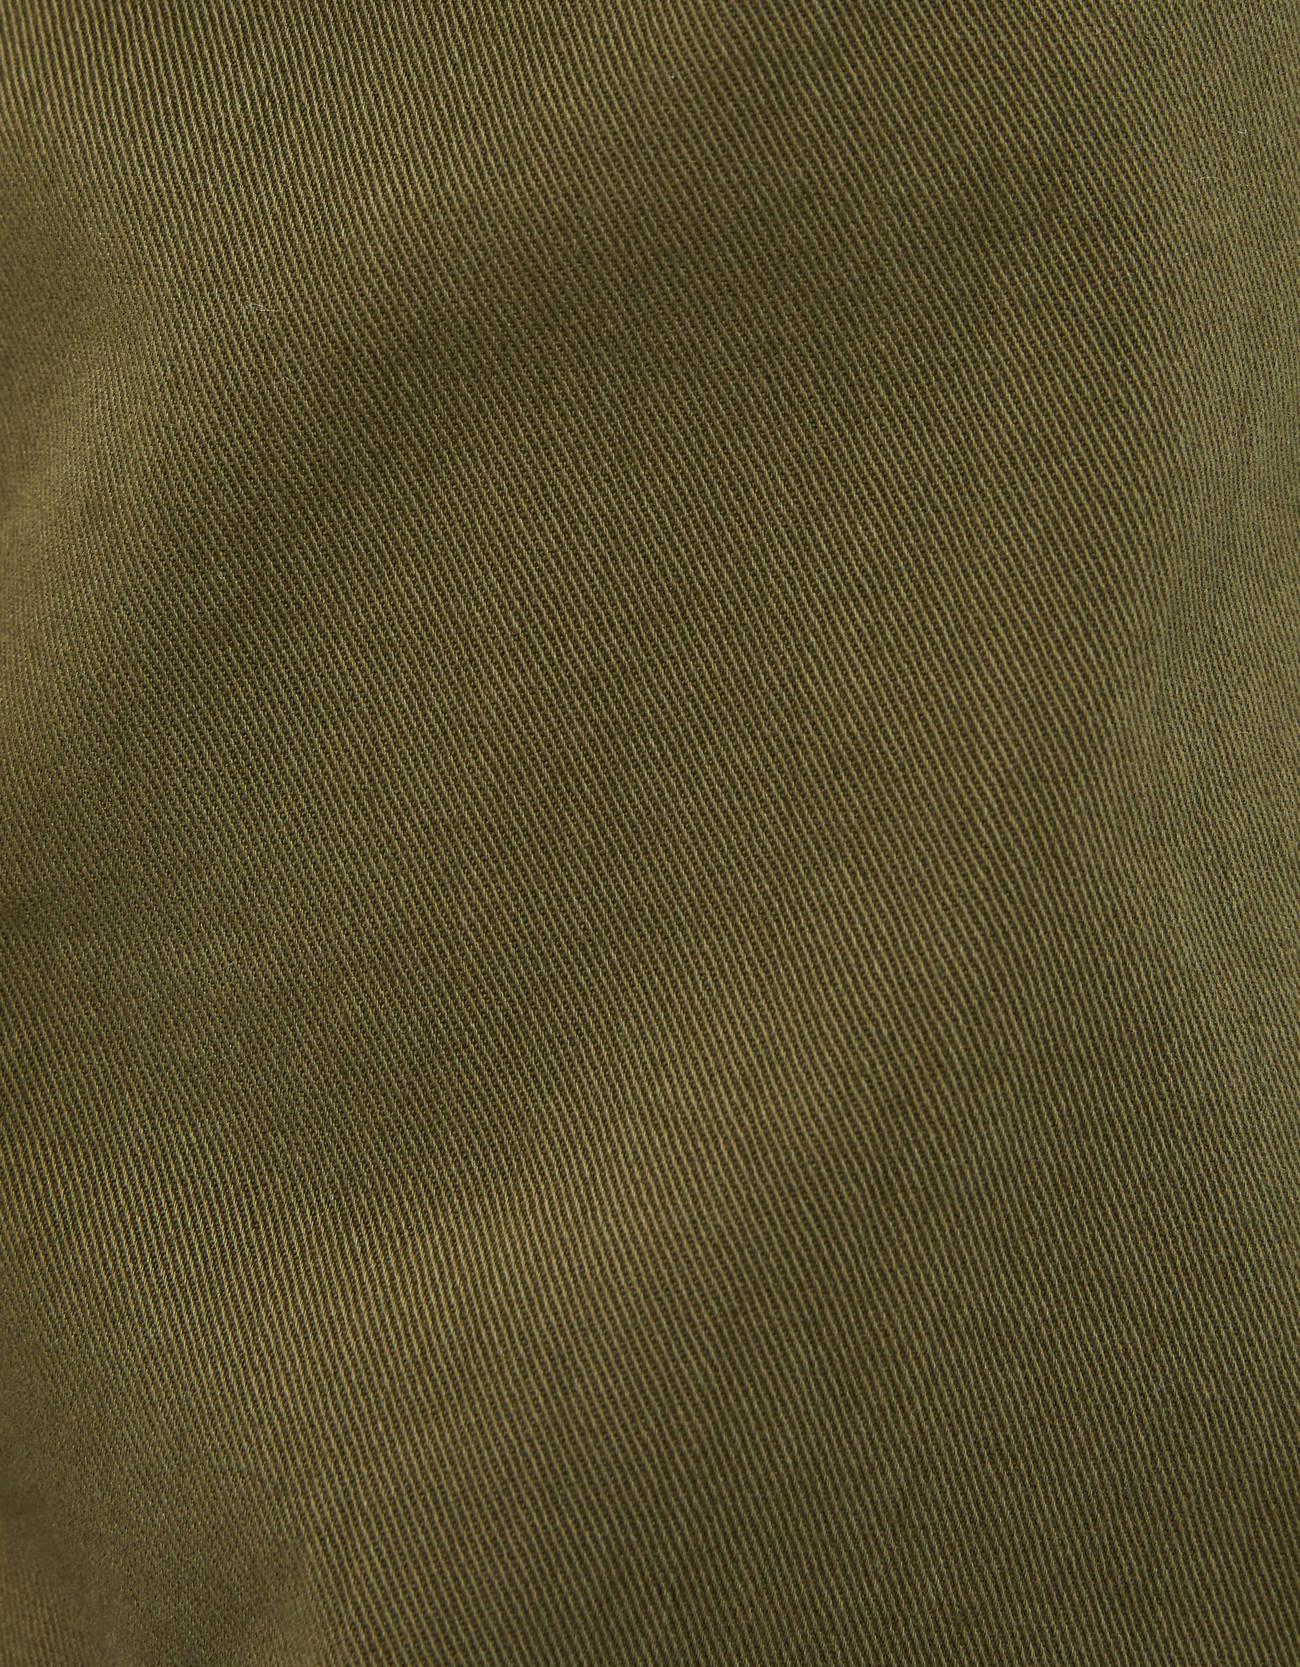 Спортивные брюки Utility ХАКИ Bershka